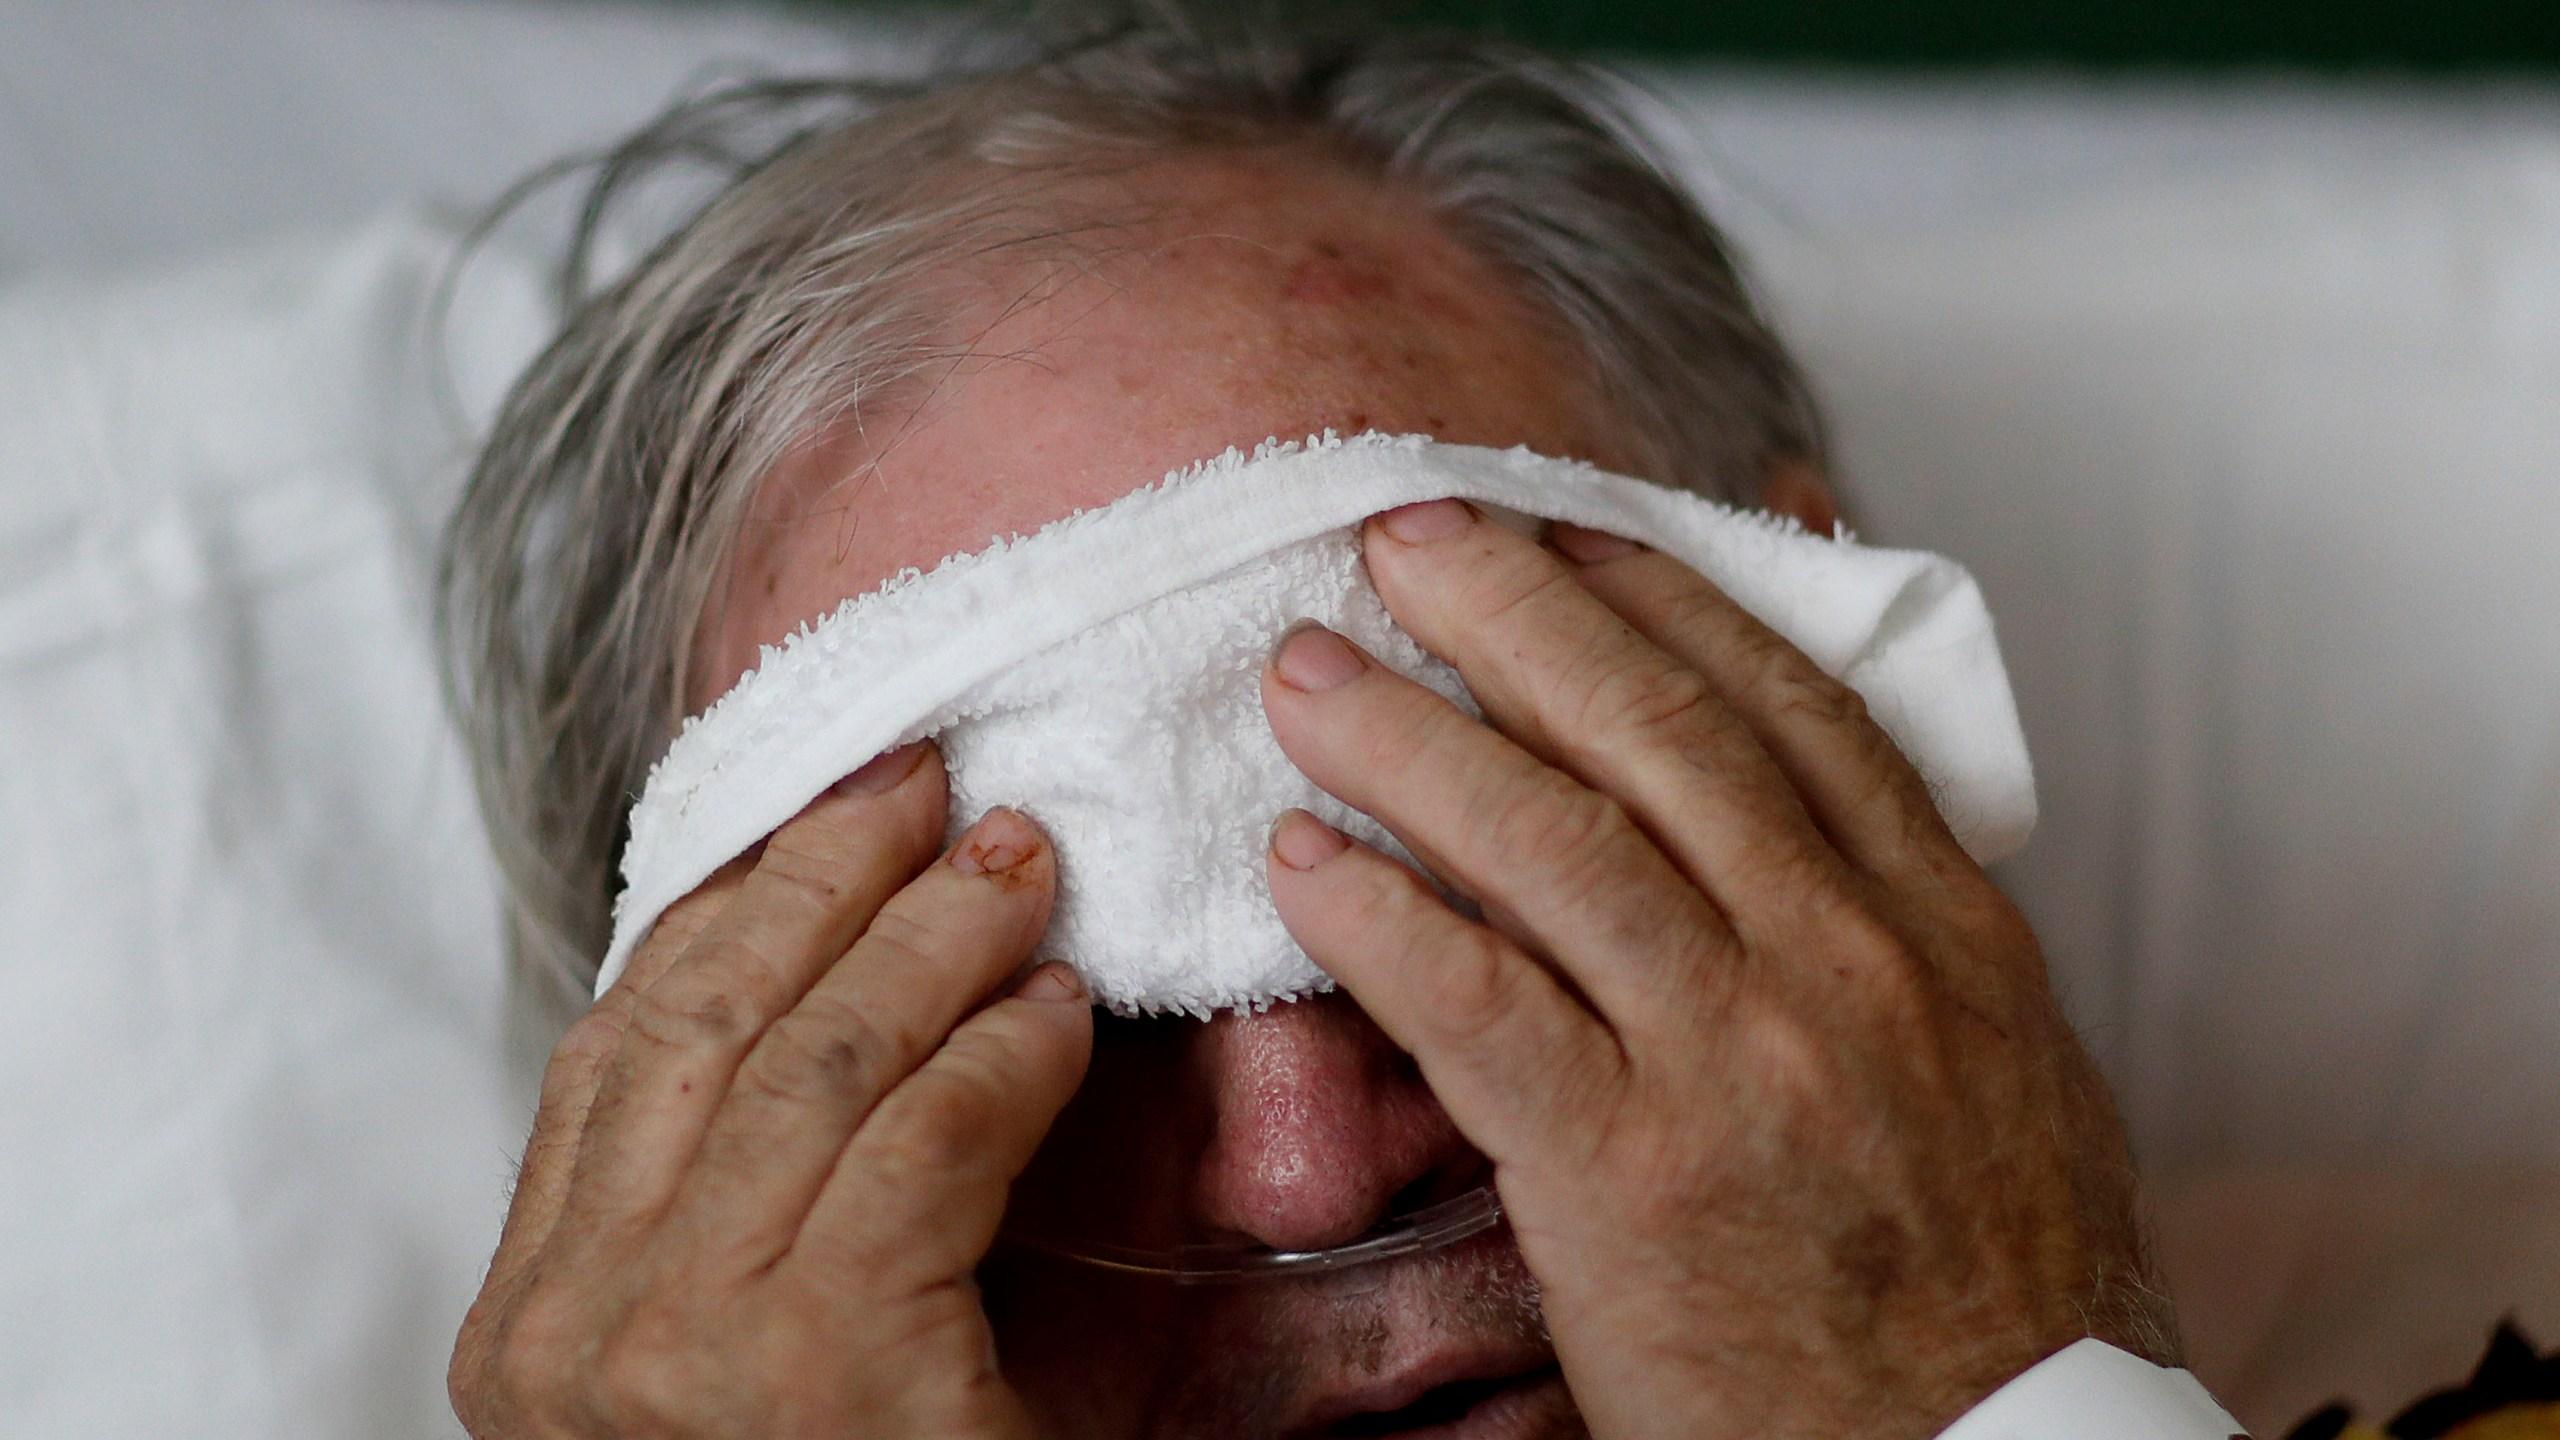 Flu and coronavirus: Similar symptoms, different fears ...